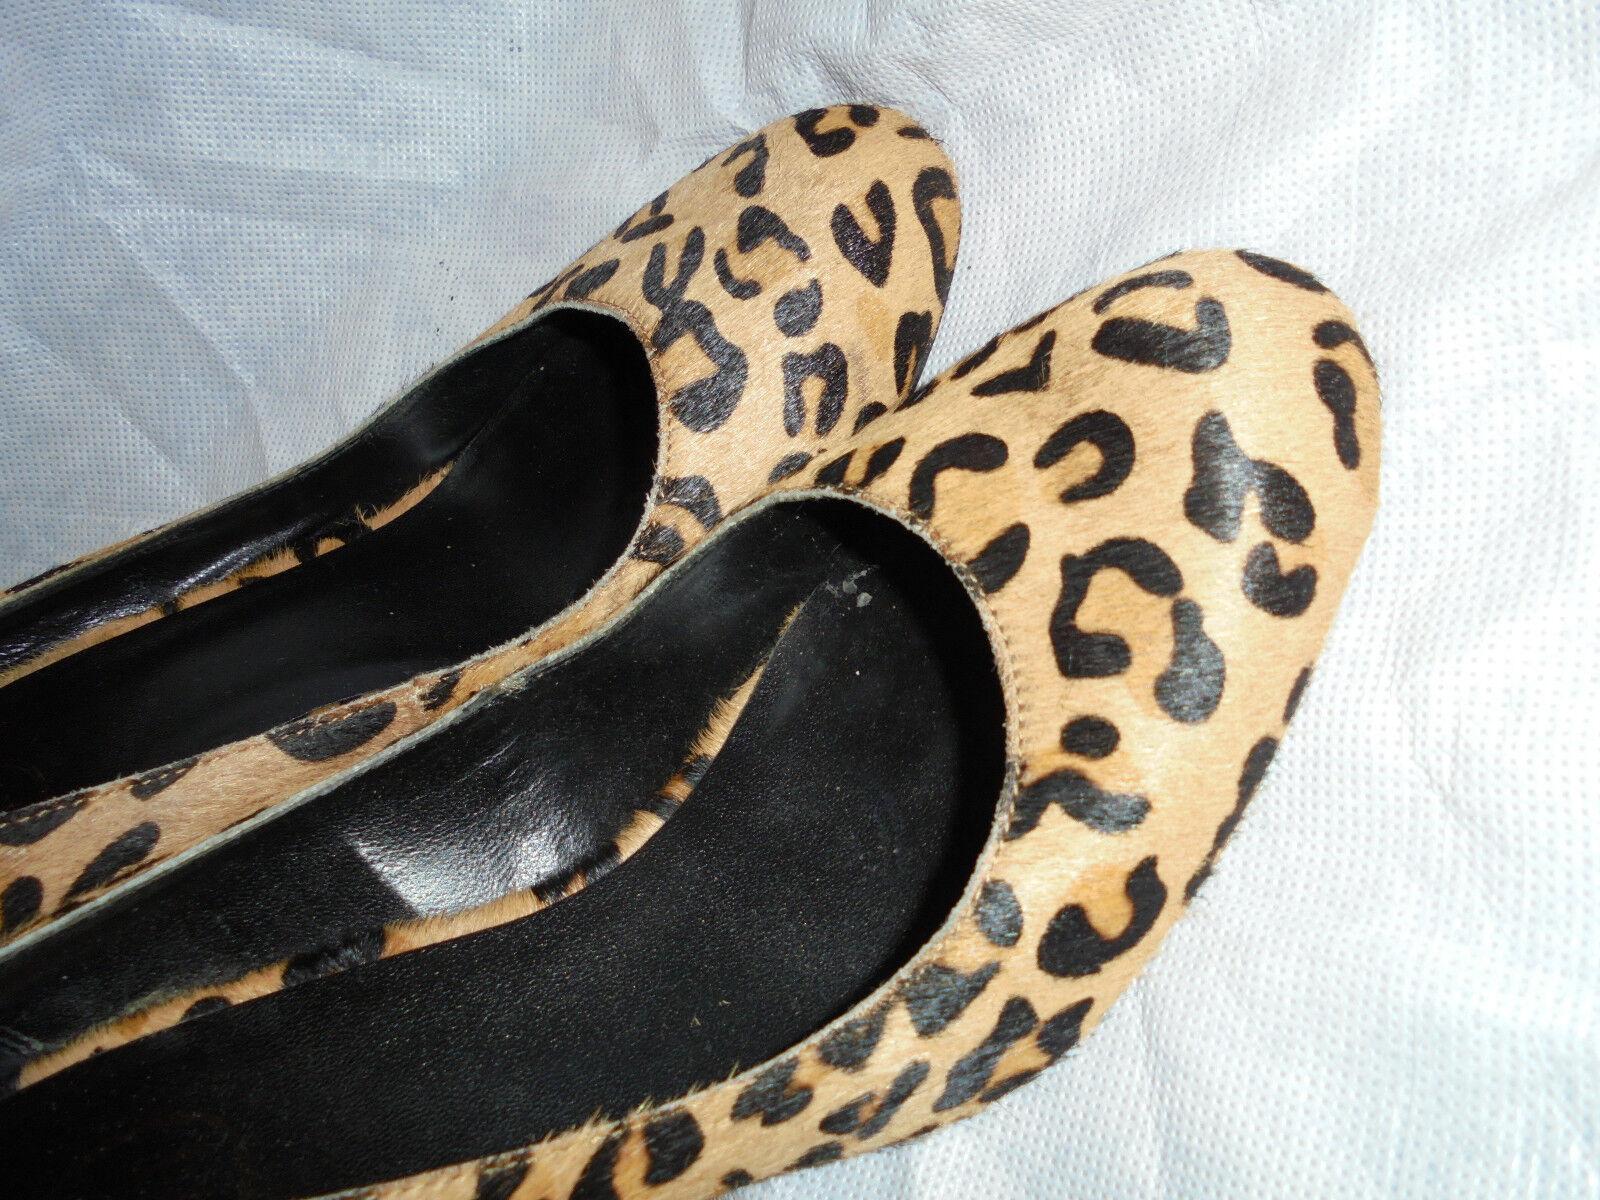 ASH WOMEN'S LEOPARD LEATHER SLIP ON HEEL Schuhe  SIZE UK 6 EU 39  VGC